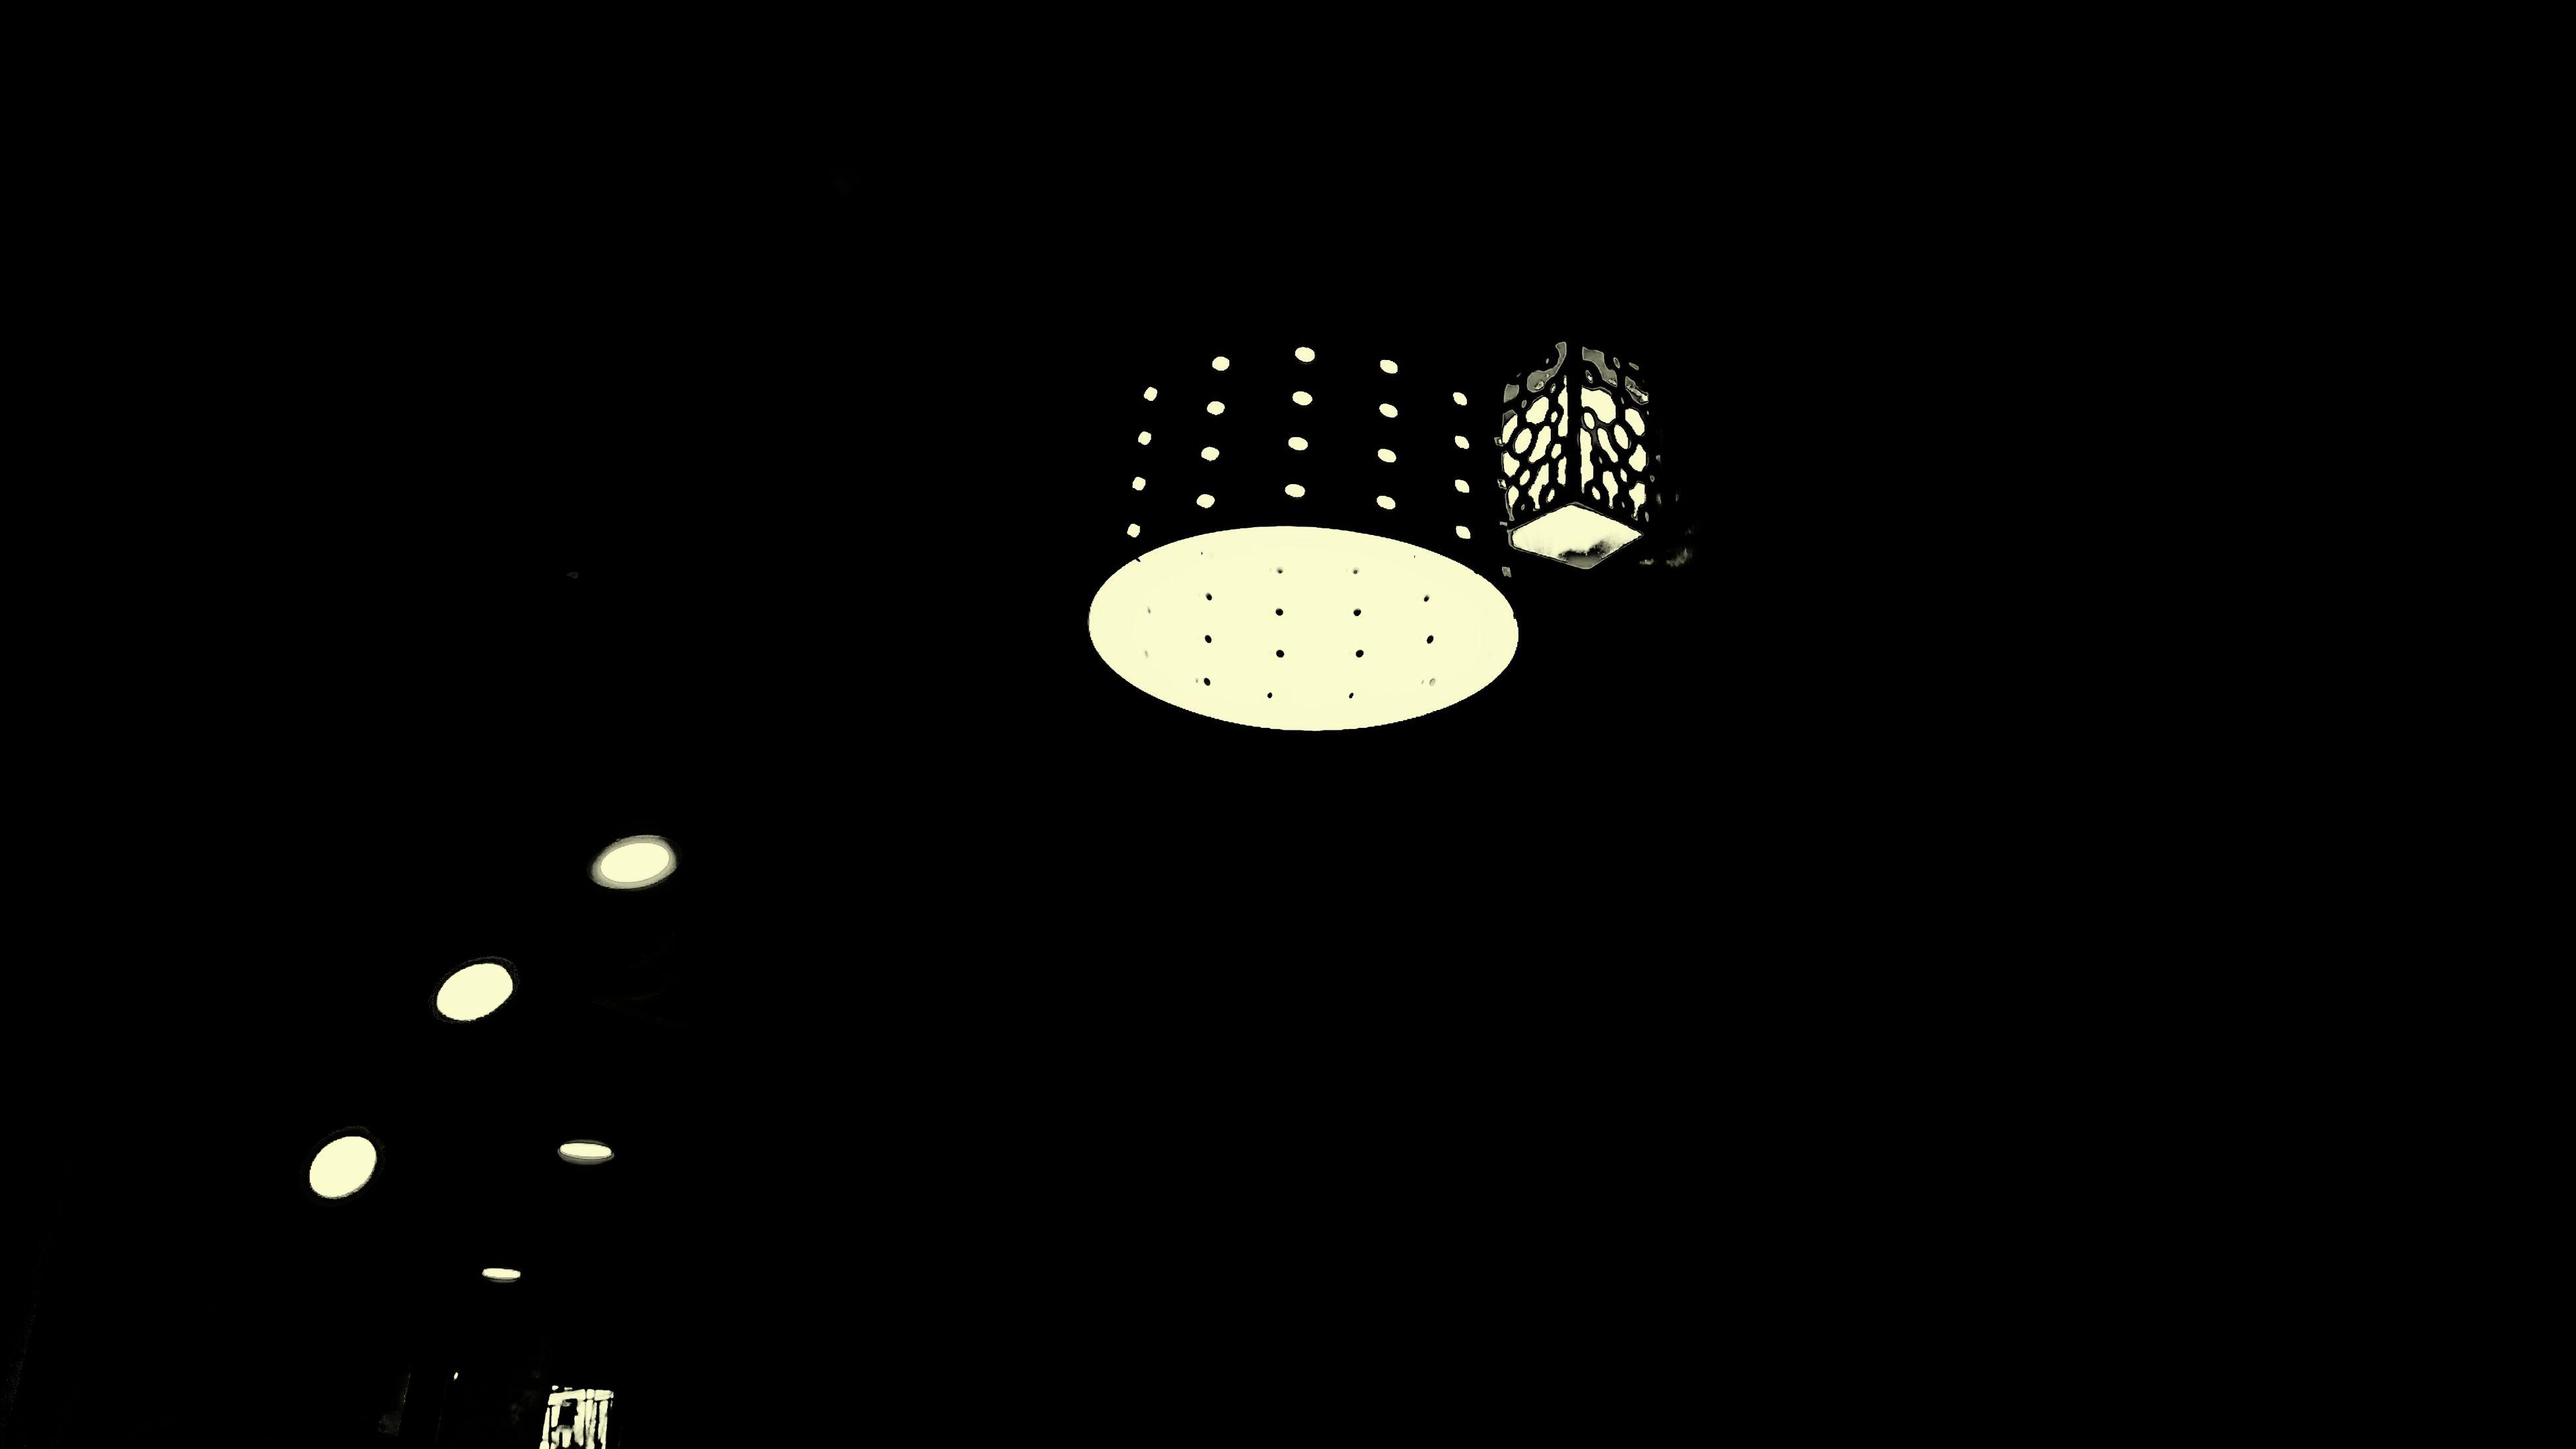 lighting equipment, illuminated, night, no people, copy space, dark, low angle view, light bulb, black background, studio shot, indoors, close-up